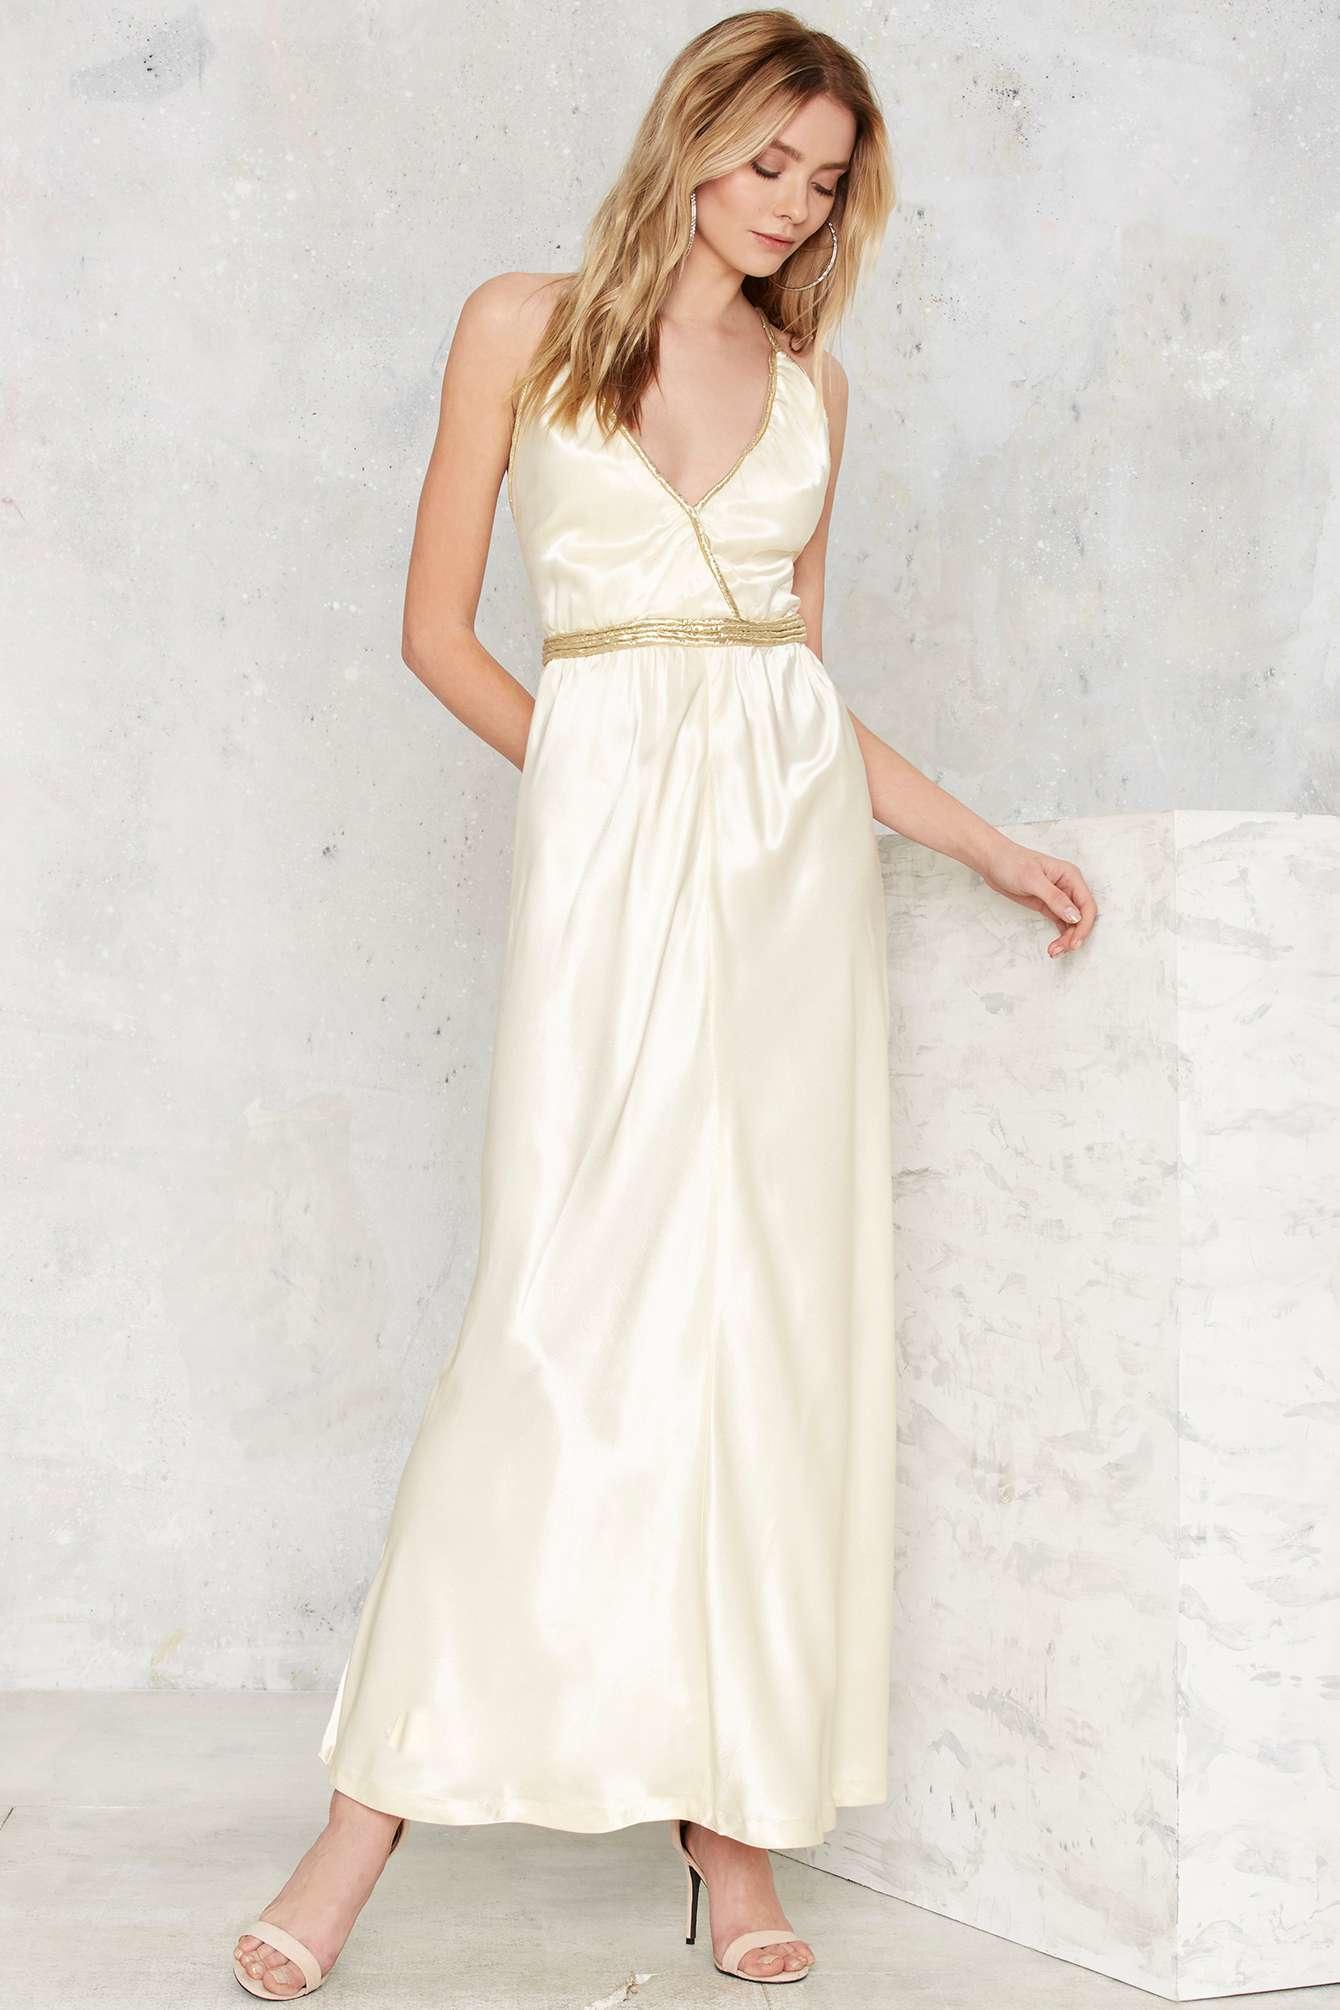 Awesome Gucci Wedding Gowns Photos - Wedding Dress Ideas ...